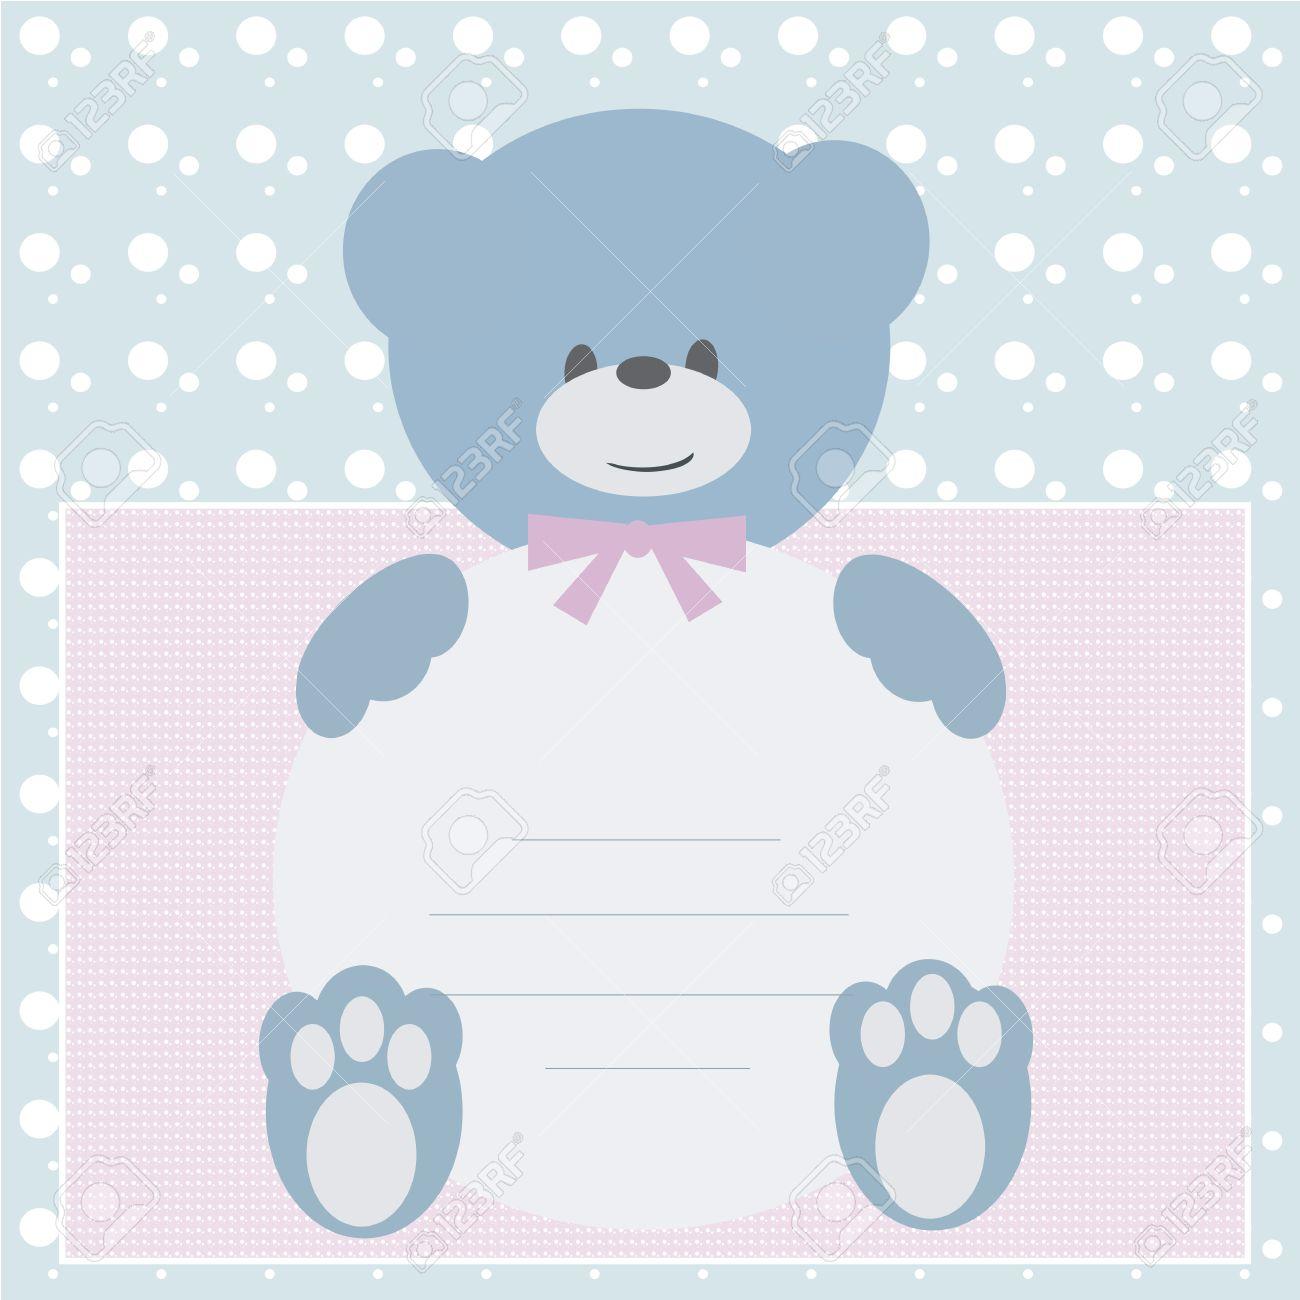 Baby shower invitation card royalty free cliparts vectors and baby shower invitation card stock vector 12467134 filmwisefo